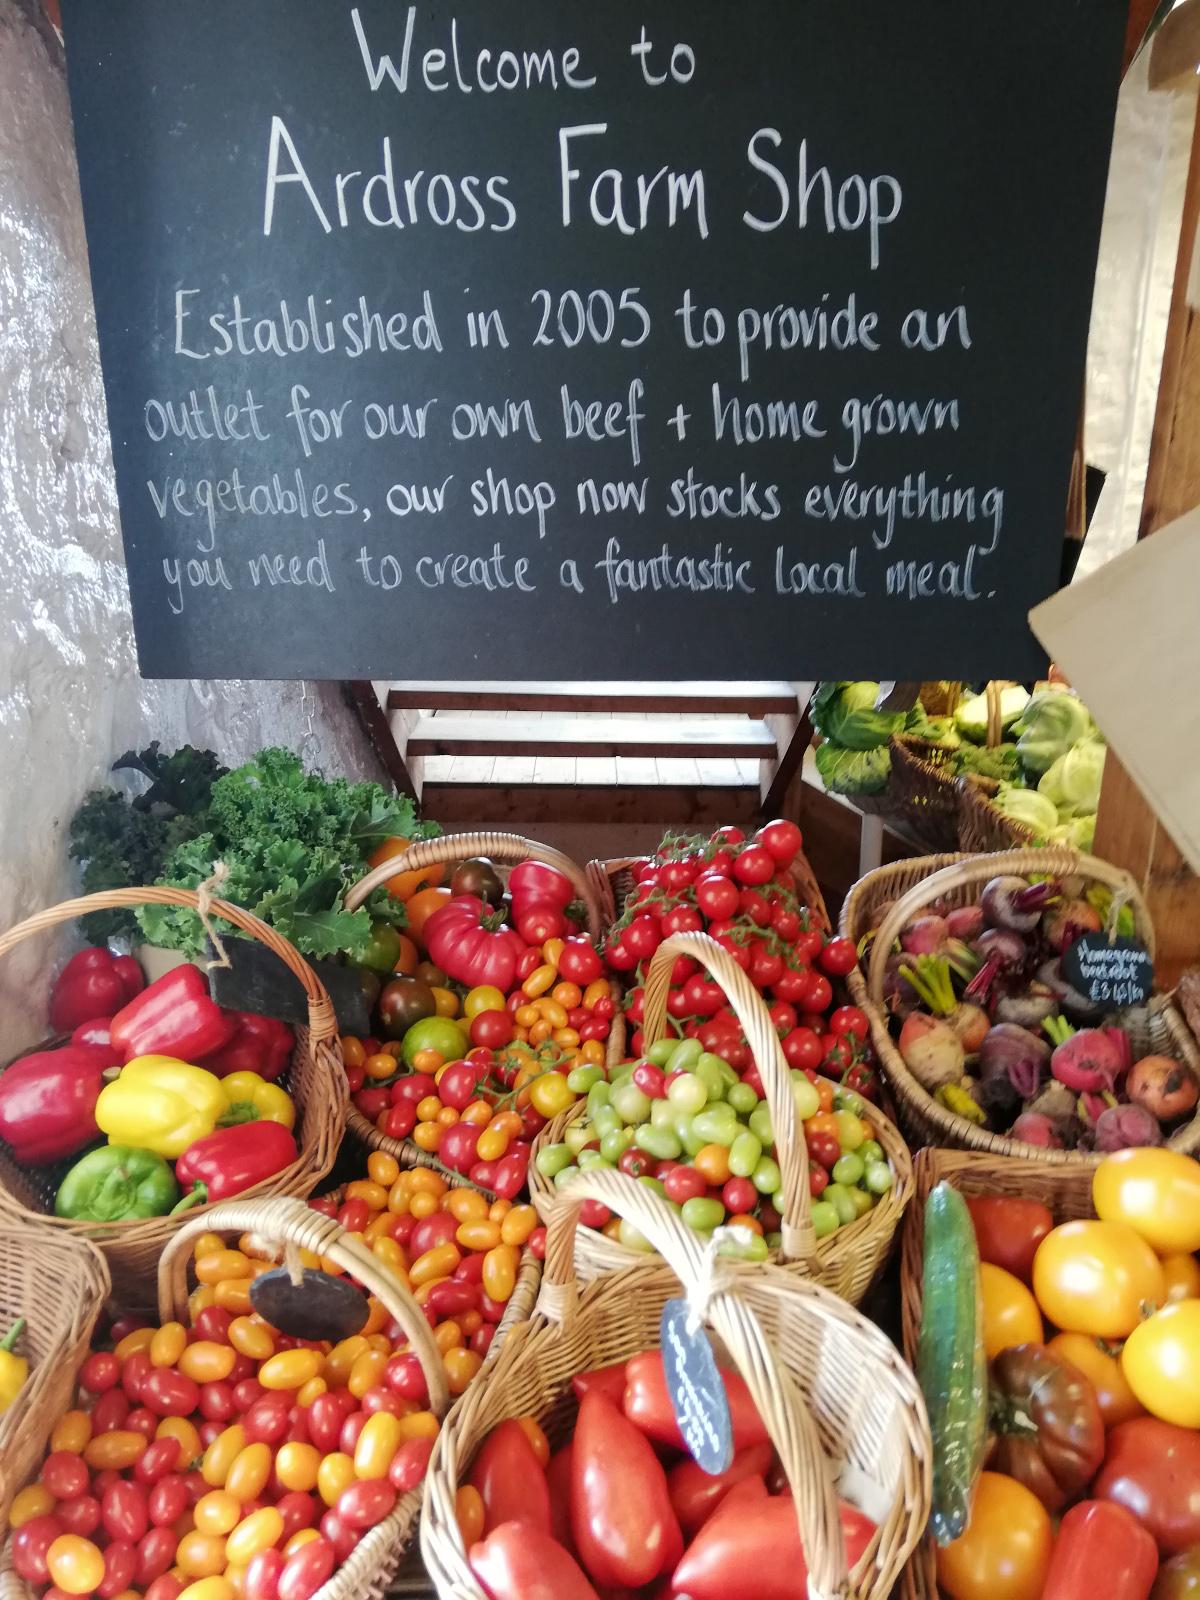 Ardross Farm Shop, Fife